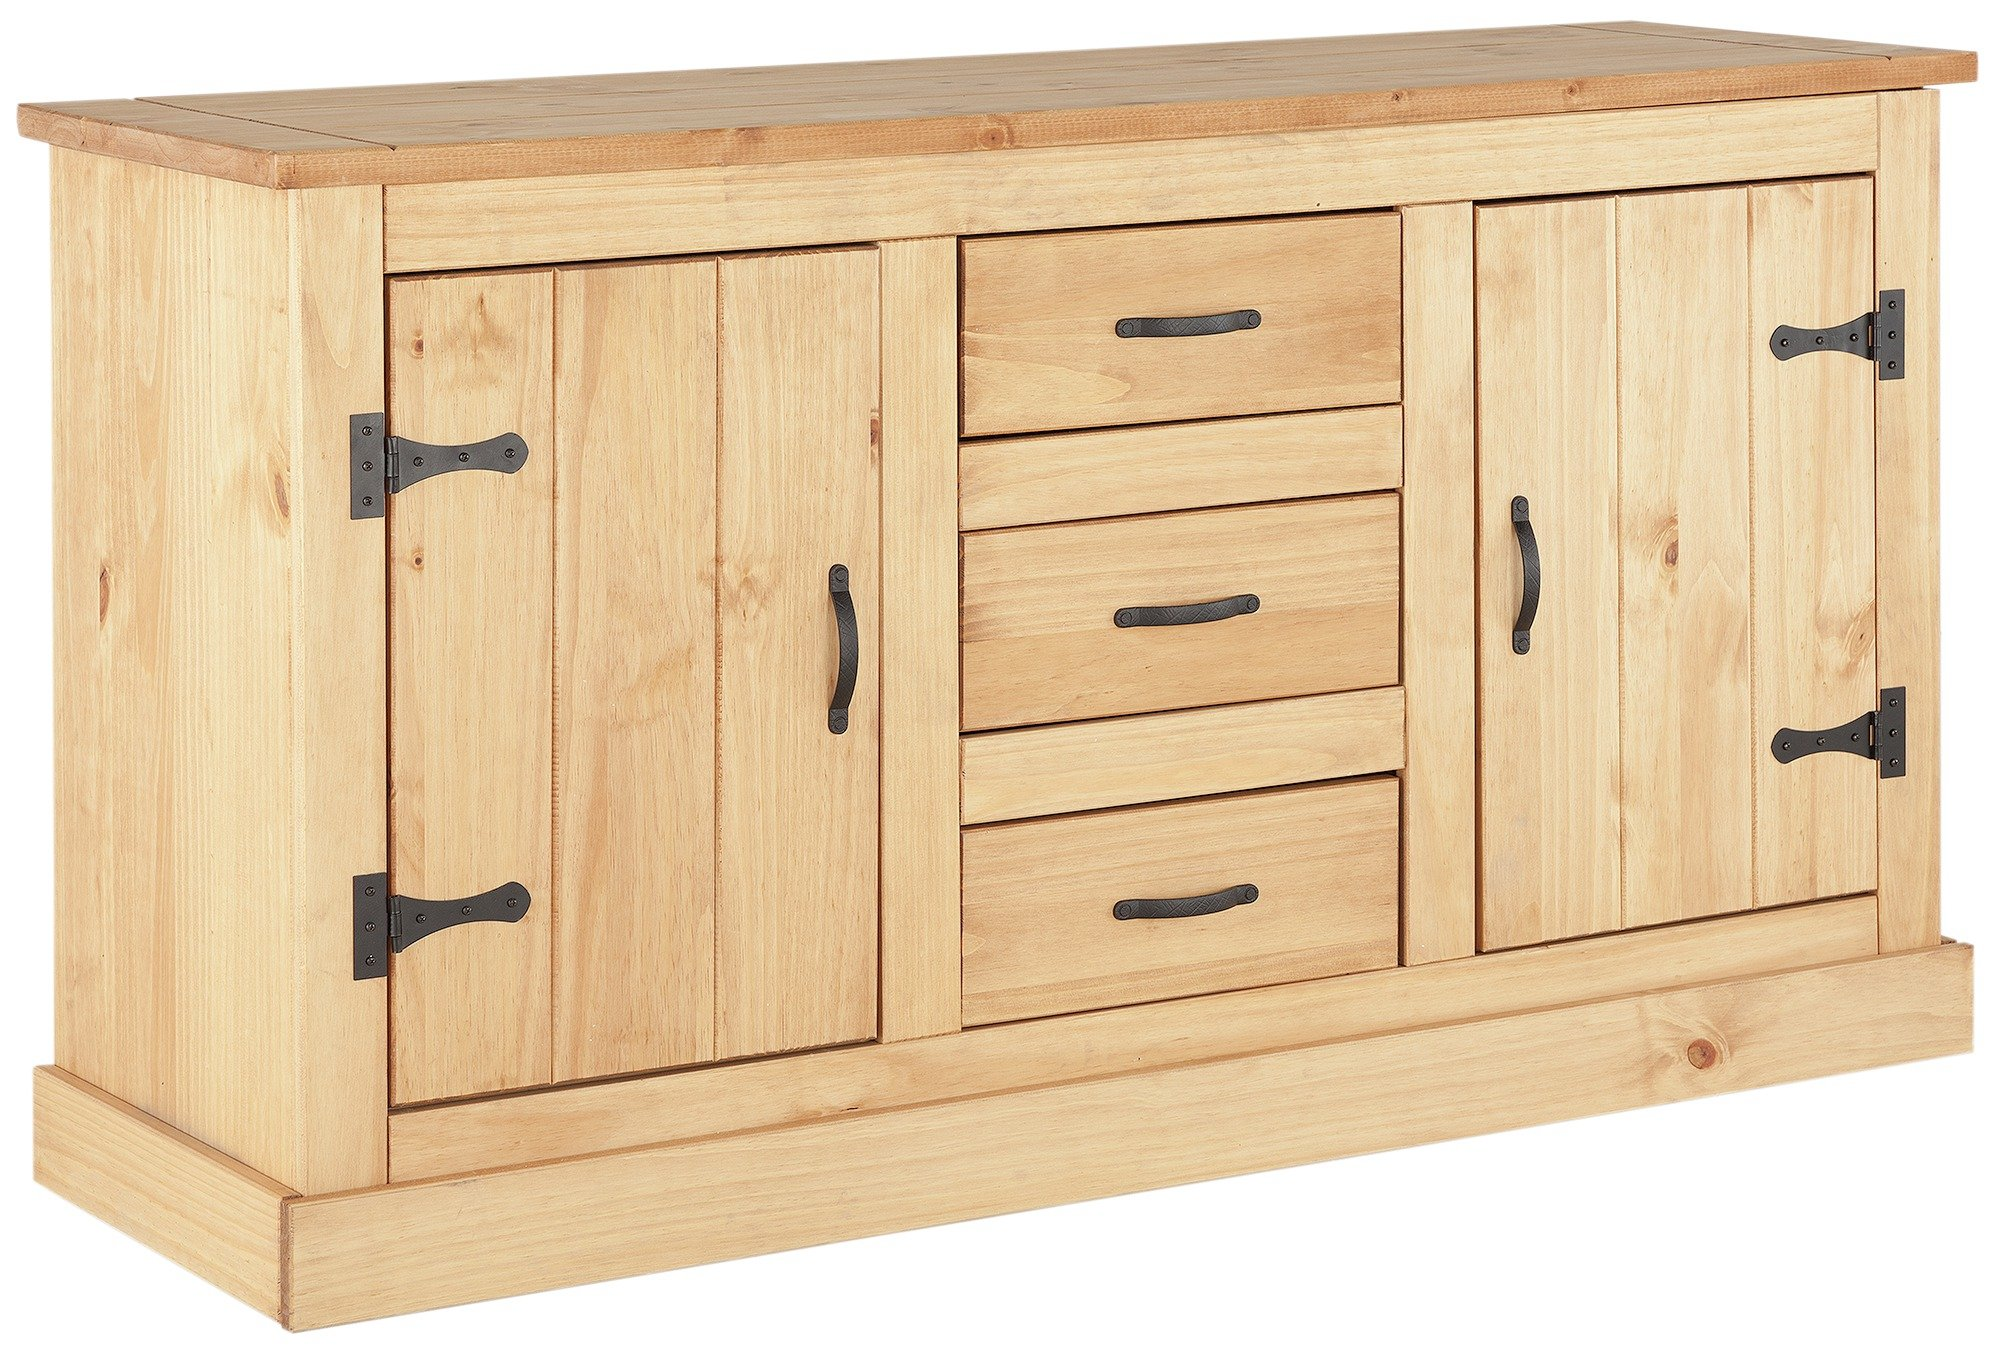 'Home San Diego 2 Door 3 Drawer Solid Pine Sideboard